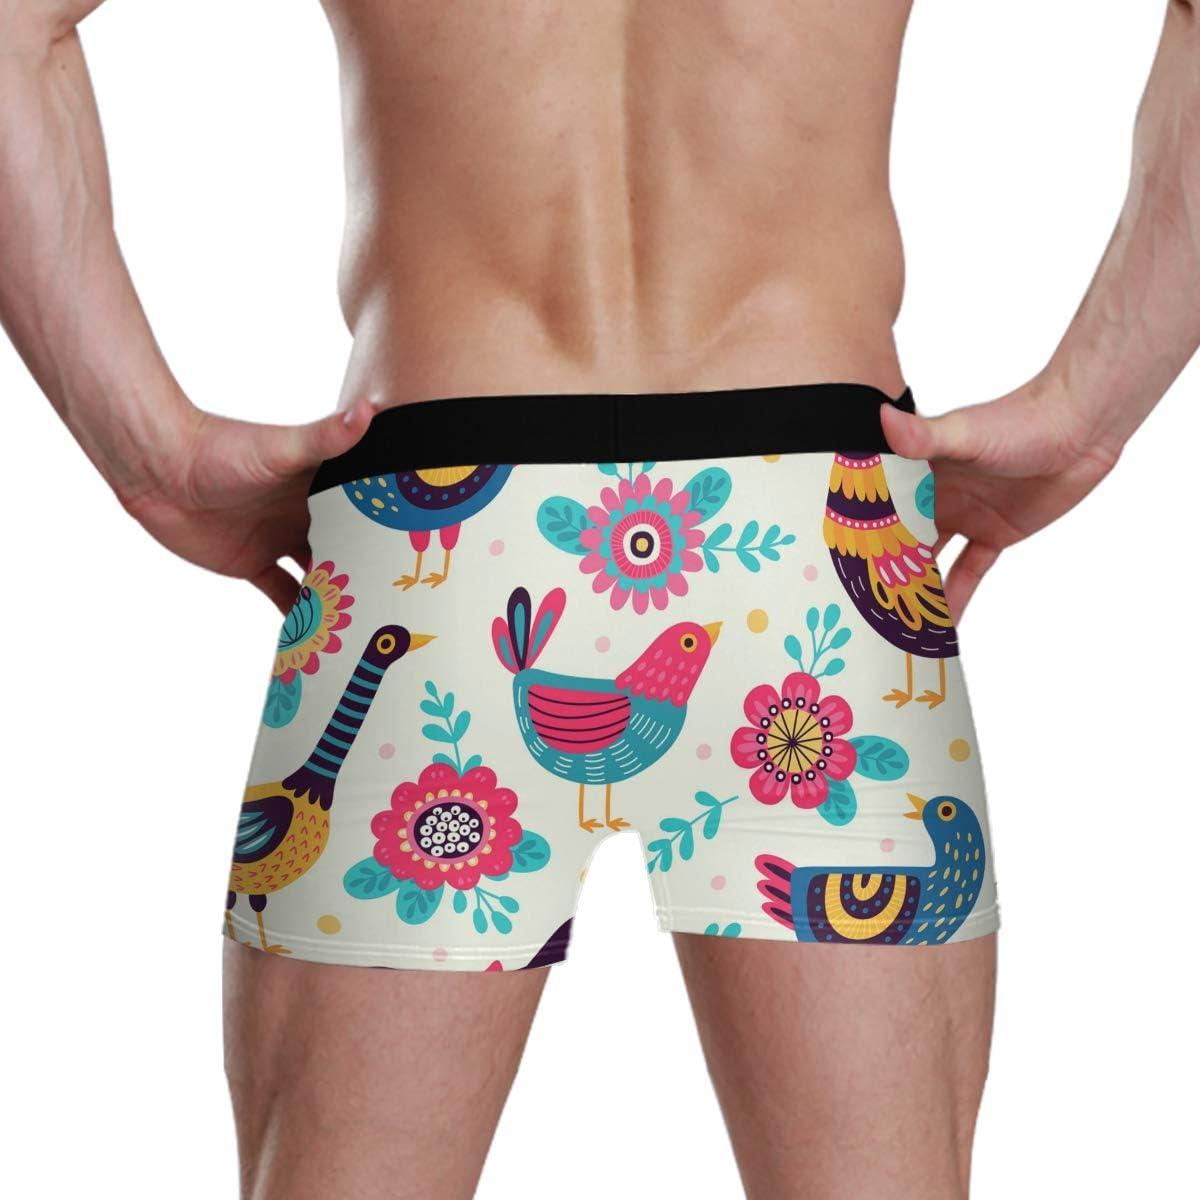 ATZUCL Mens Underwear Elastic Boxer Briefs Beautiful Peacock Soft Breathable S for Men